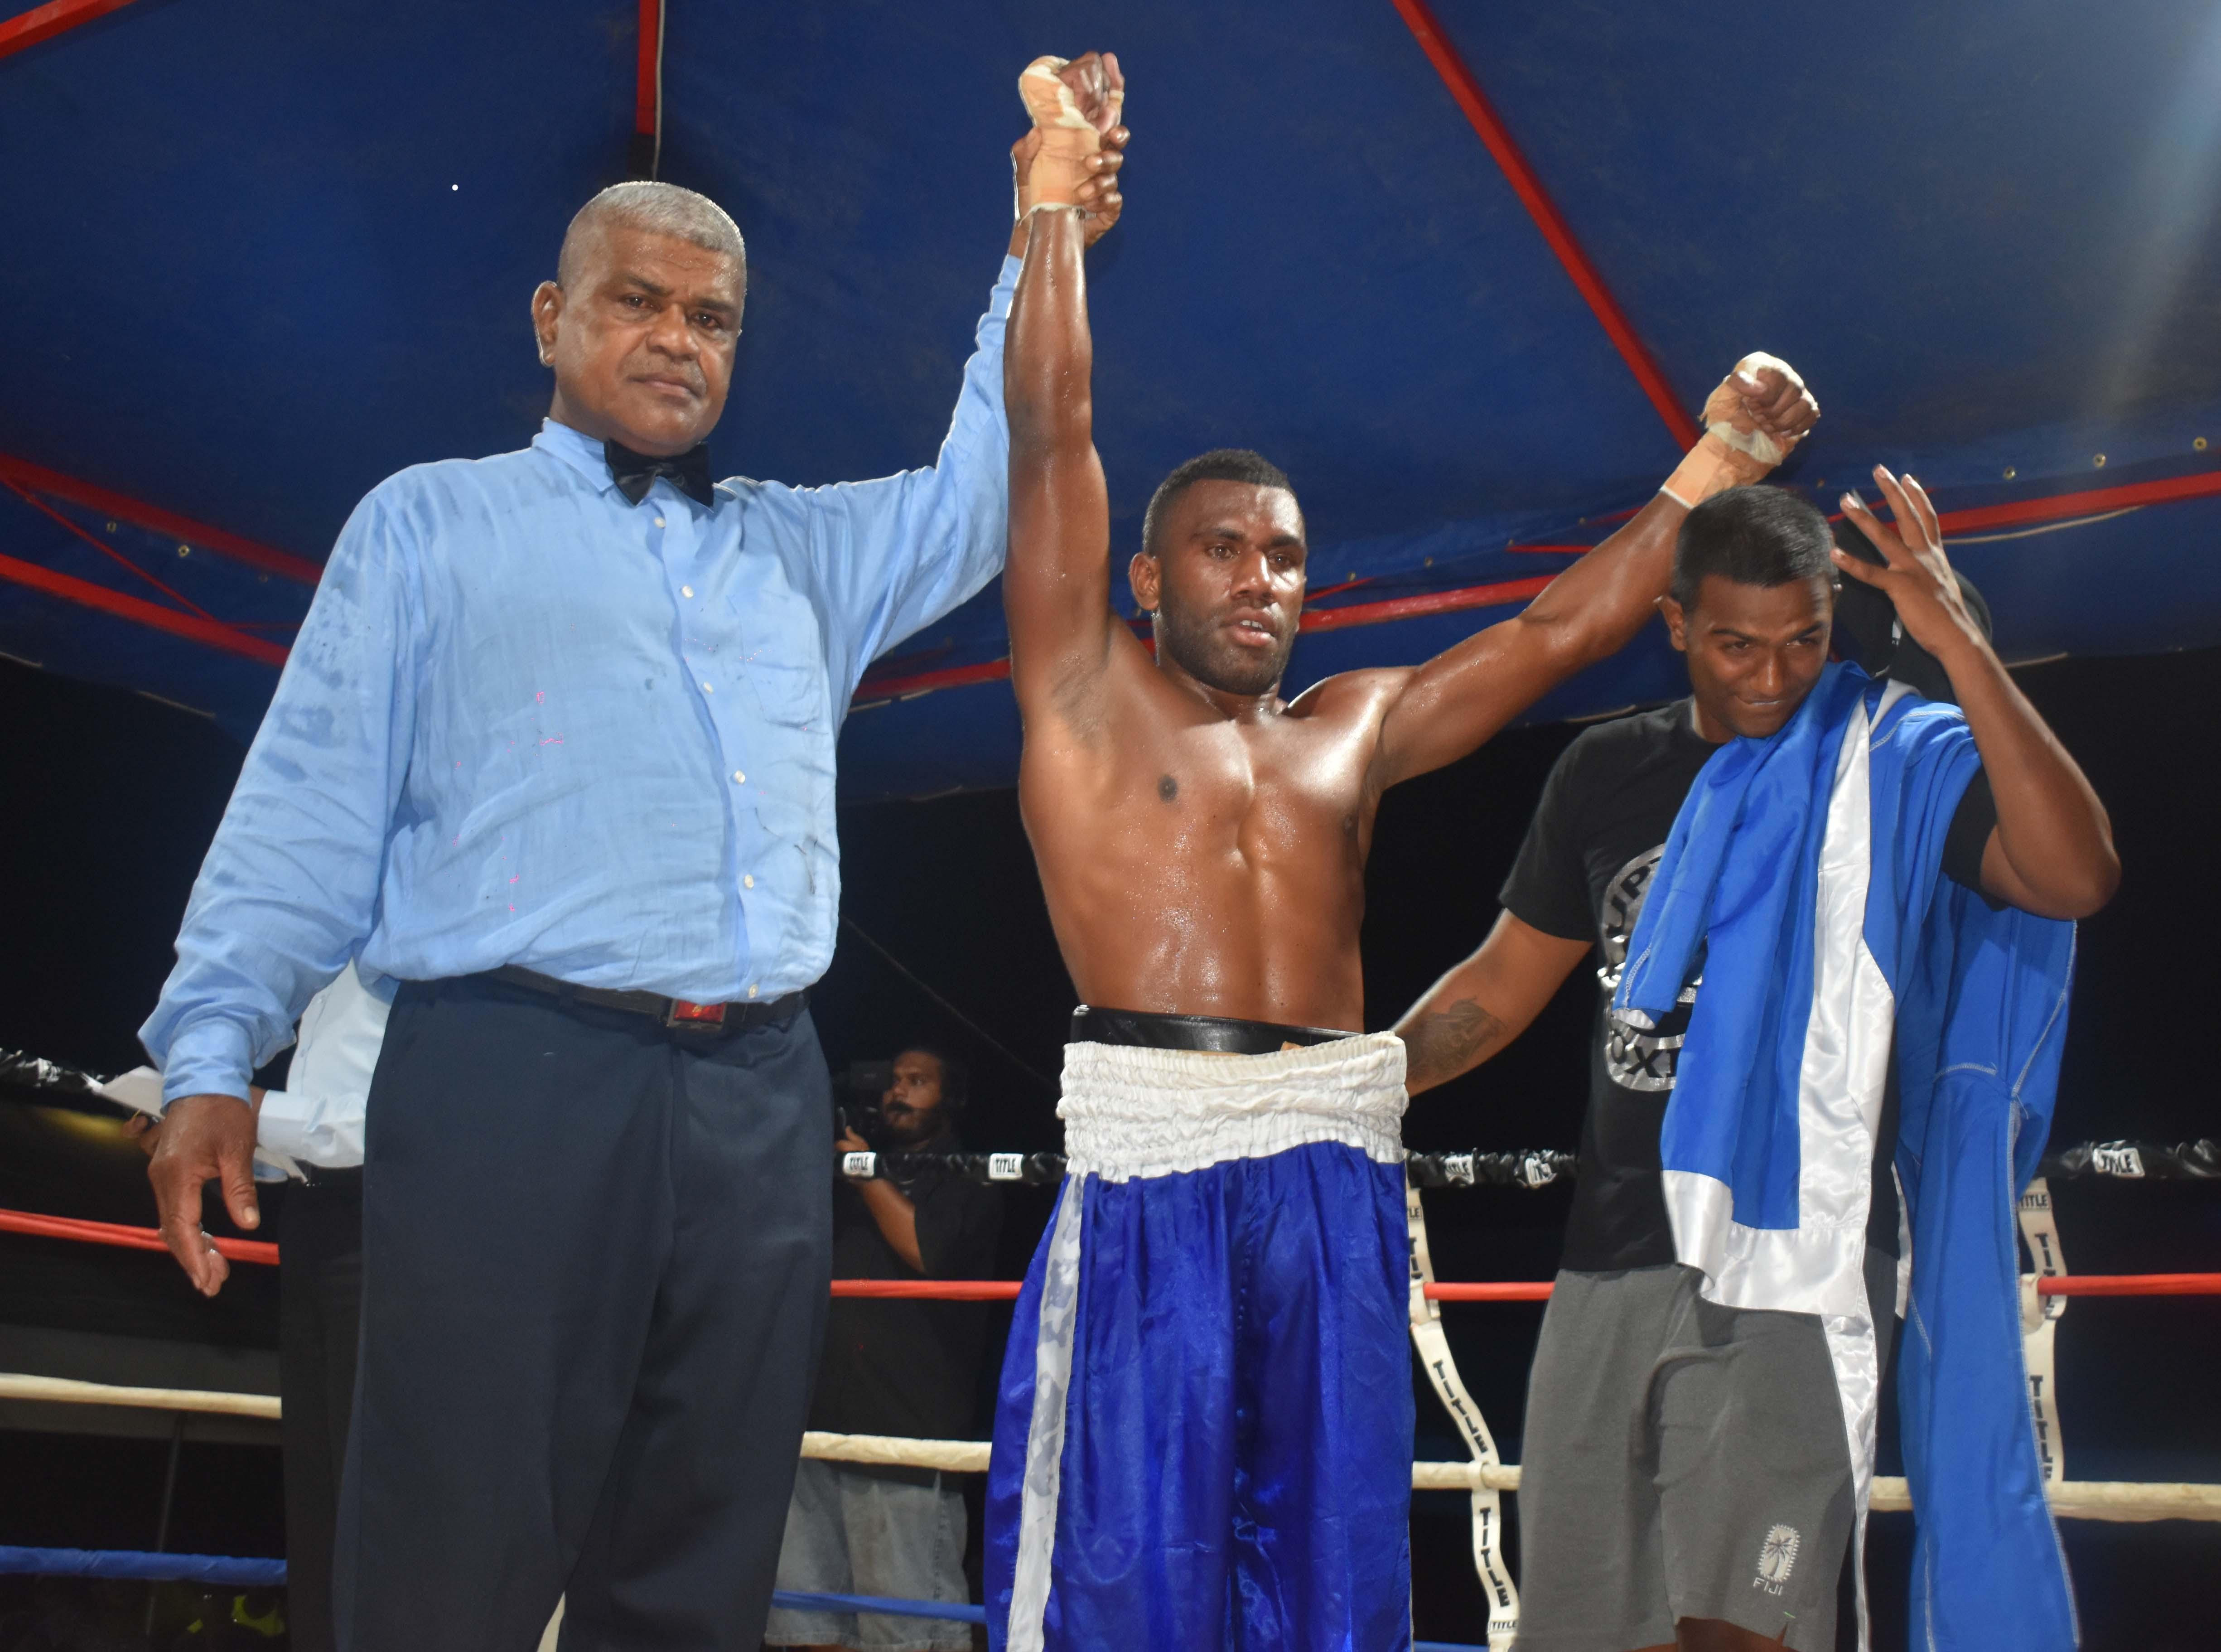 Malakai Marama wins over Rahul Pillay in the boxing programe at the Prince Charles Park in Nadi last night. Photo: WAISEA NASOKIA